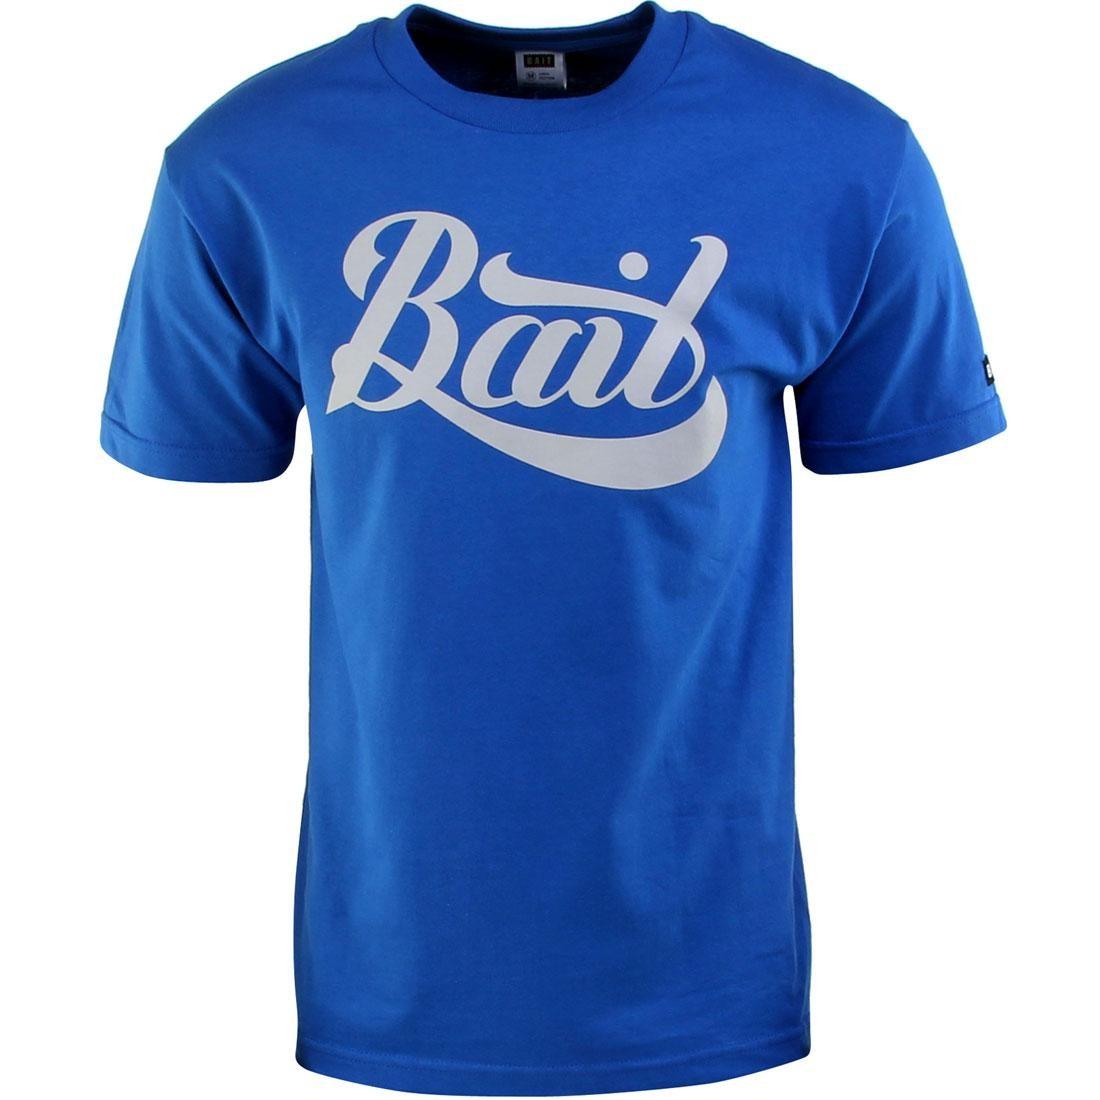 BAIT Script Logo Tee (blue / royal blue / gray)